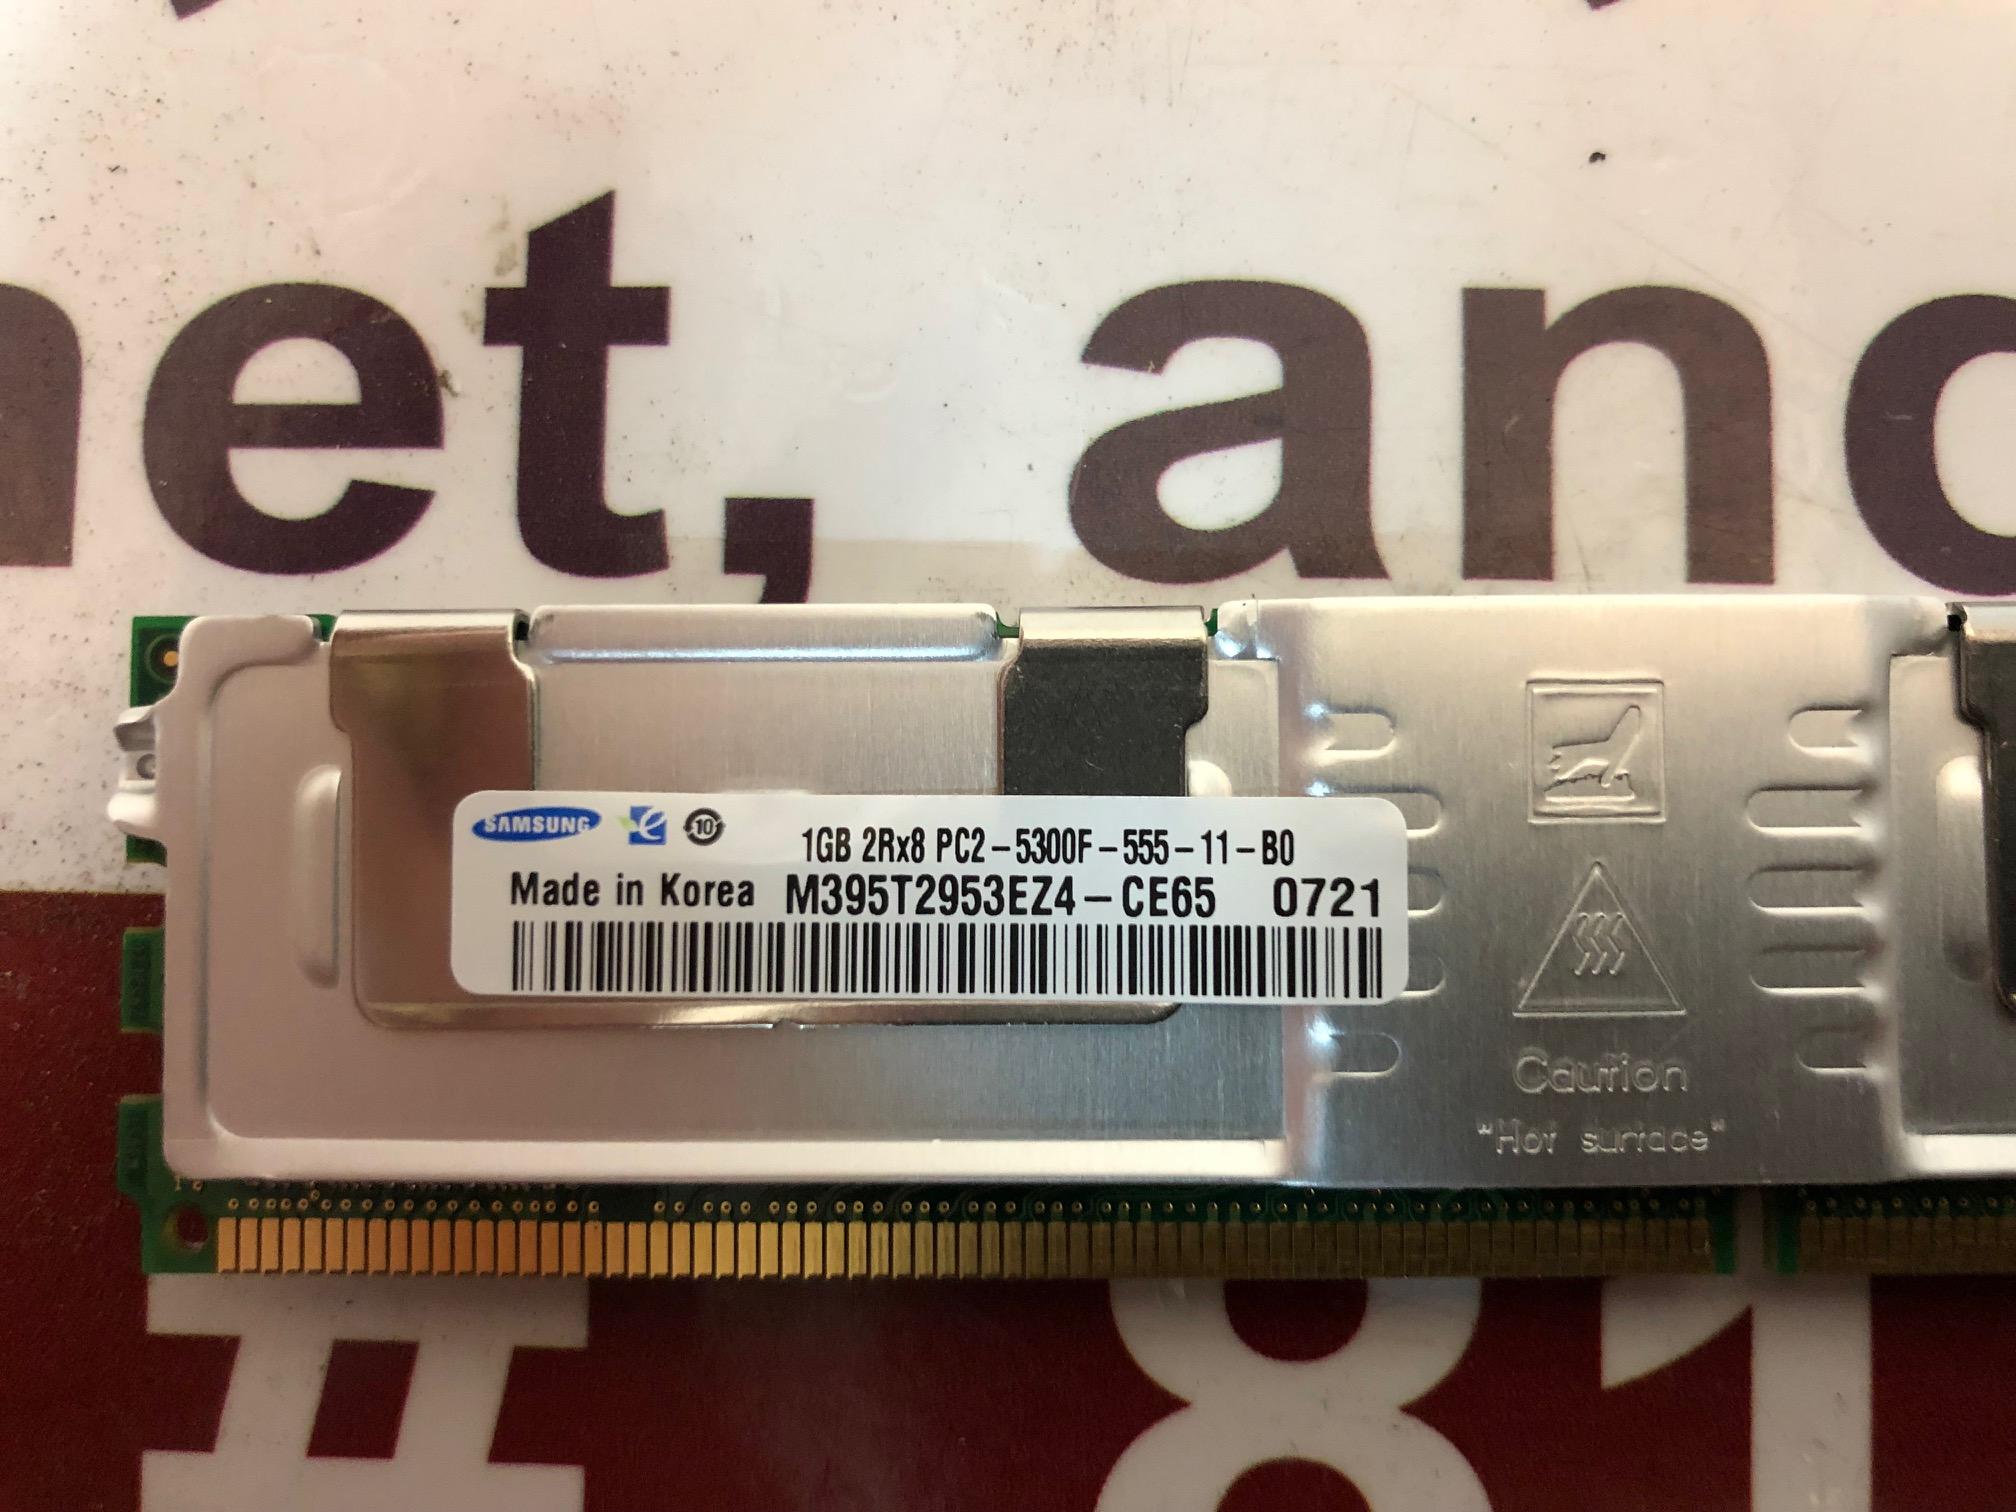 4x Samsung M395T2953EZ4-CE65 1GB 2Rx8 PC2-5300F Server RAM TESTED LOT:Z